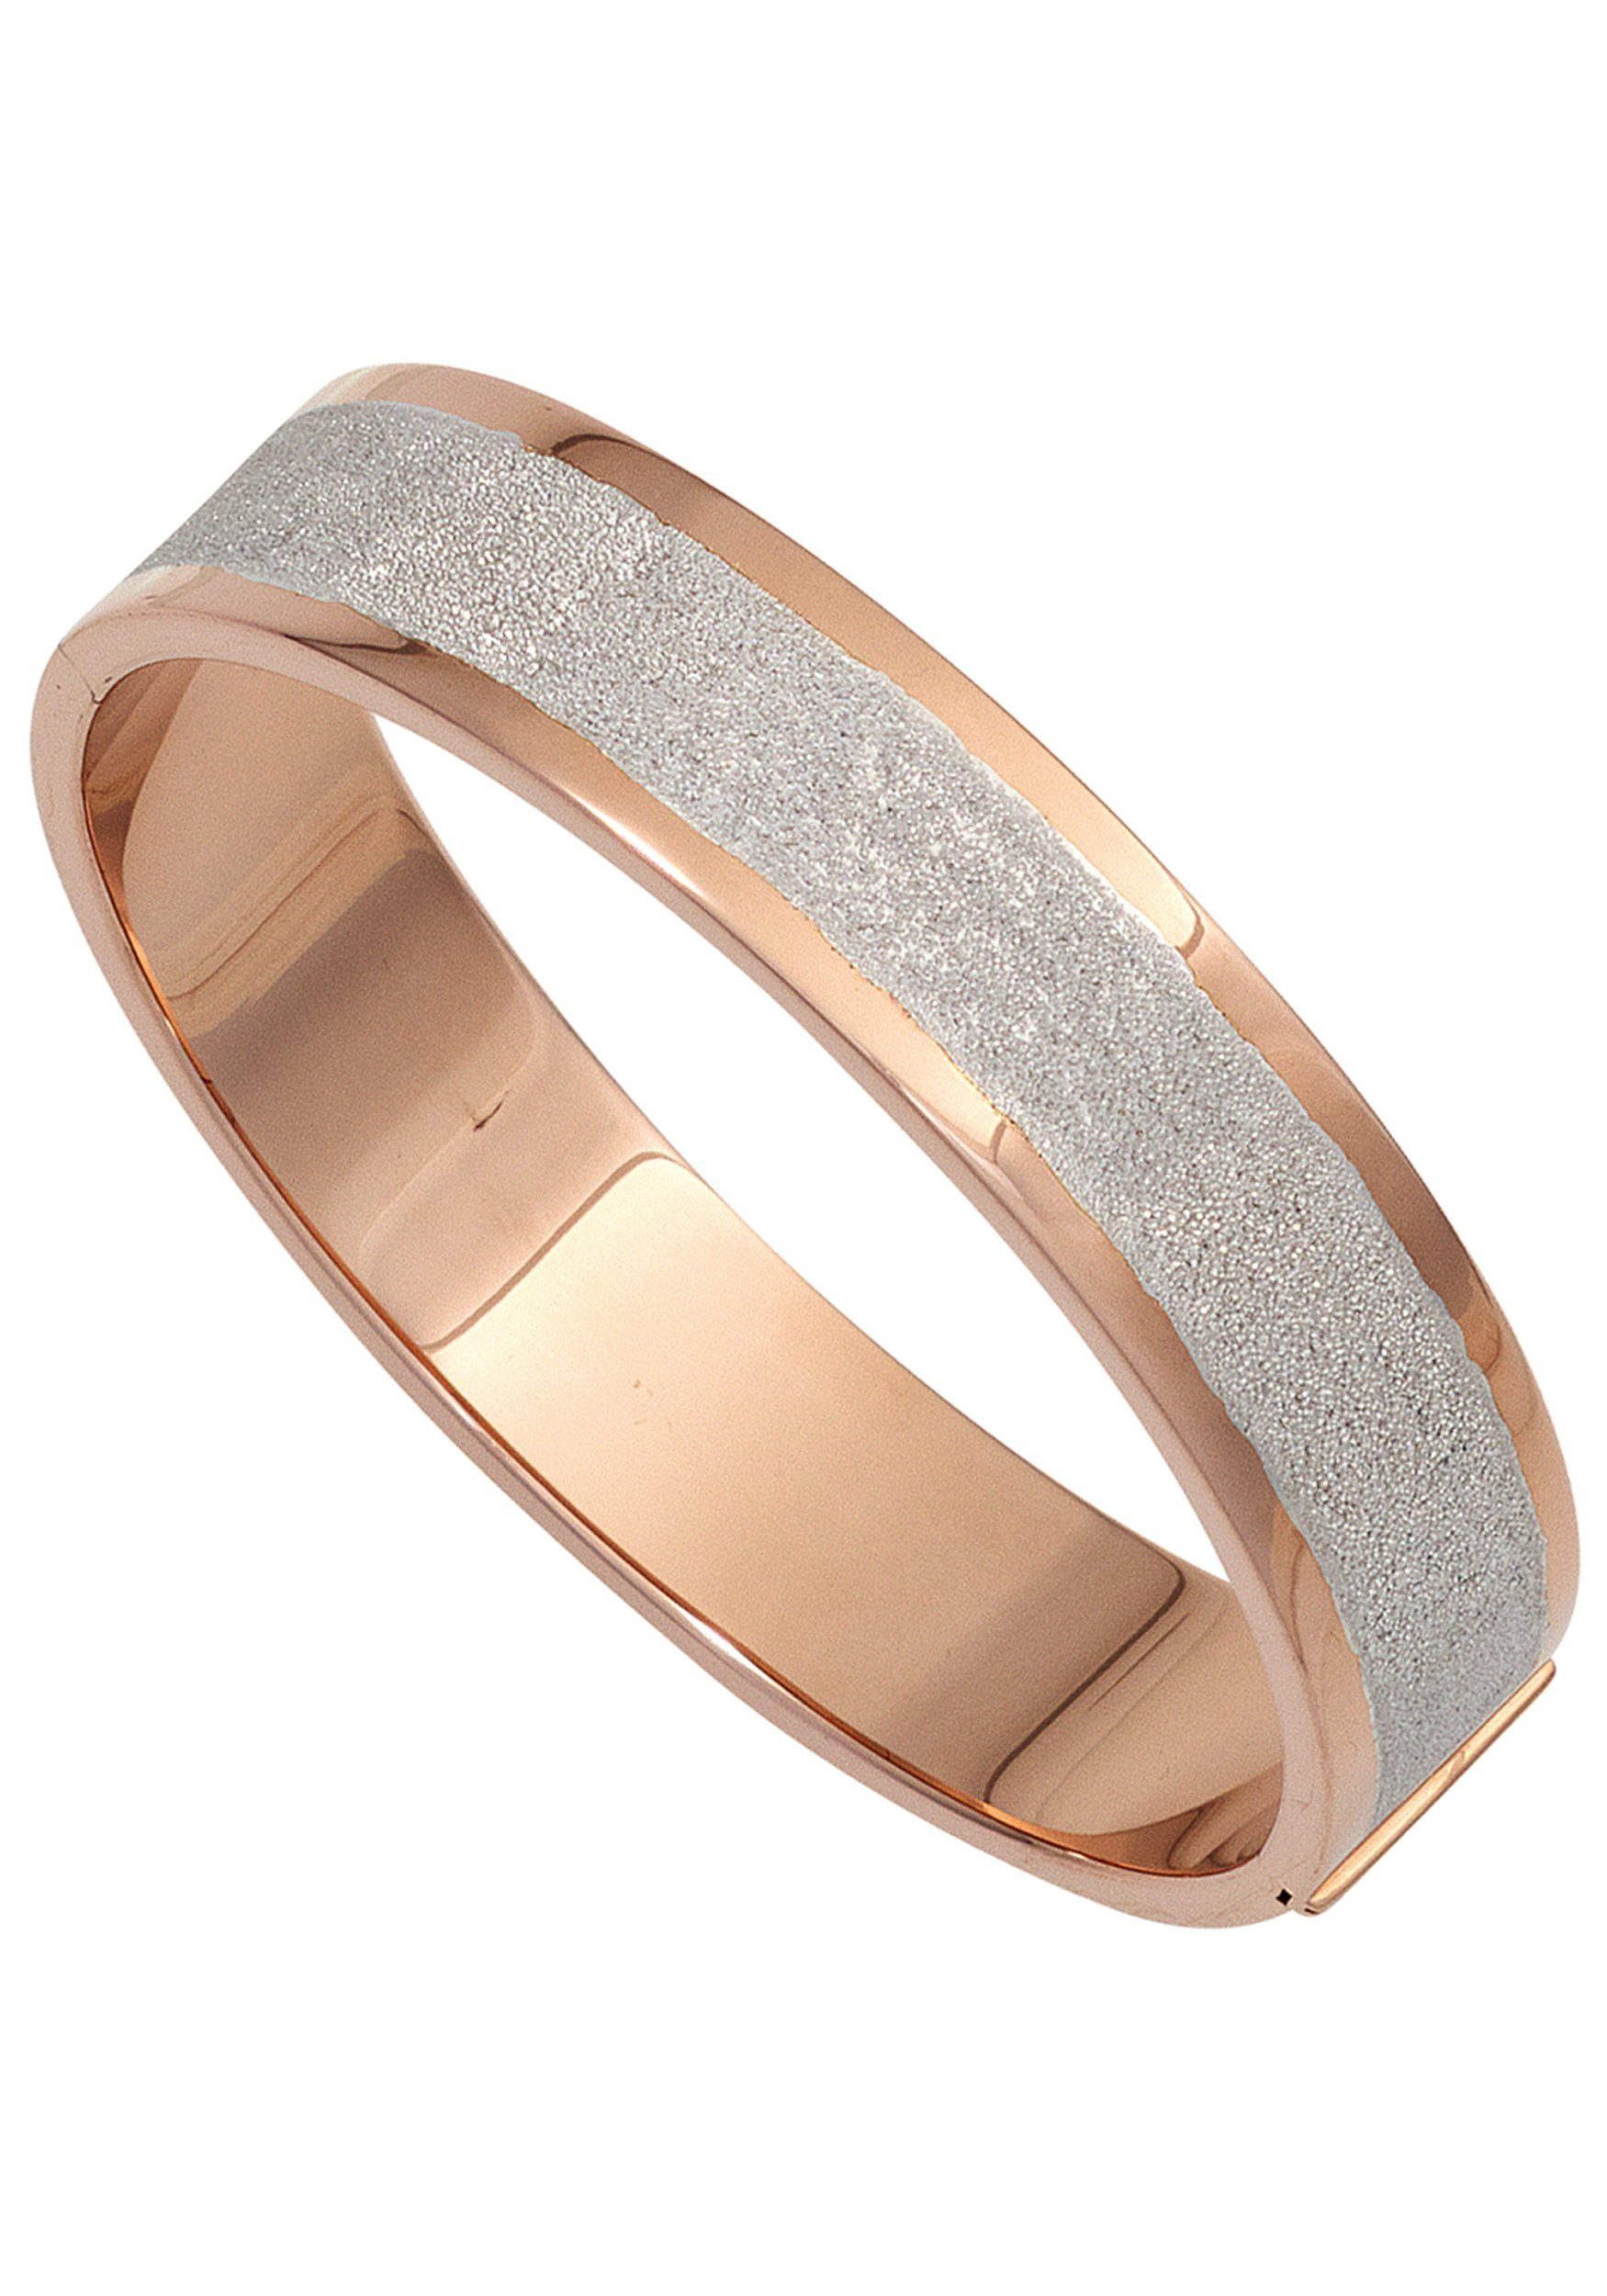 JOBO Armreif, breit oval 925 Silber roségold vergoldet